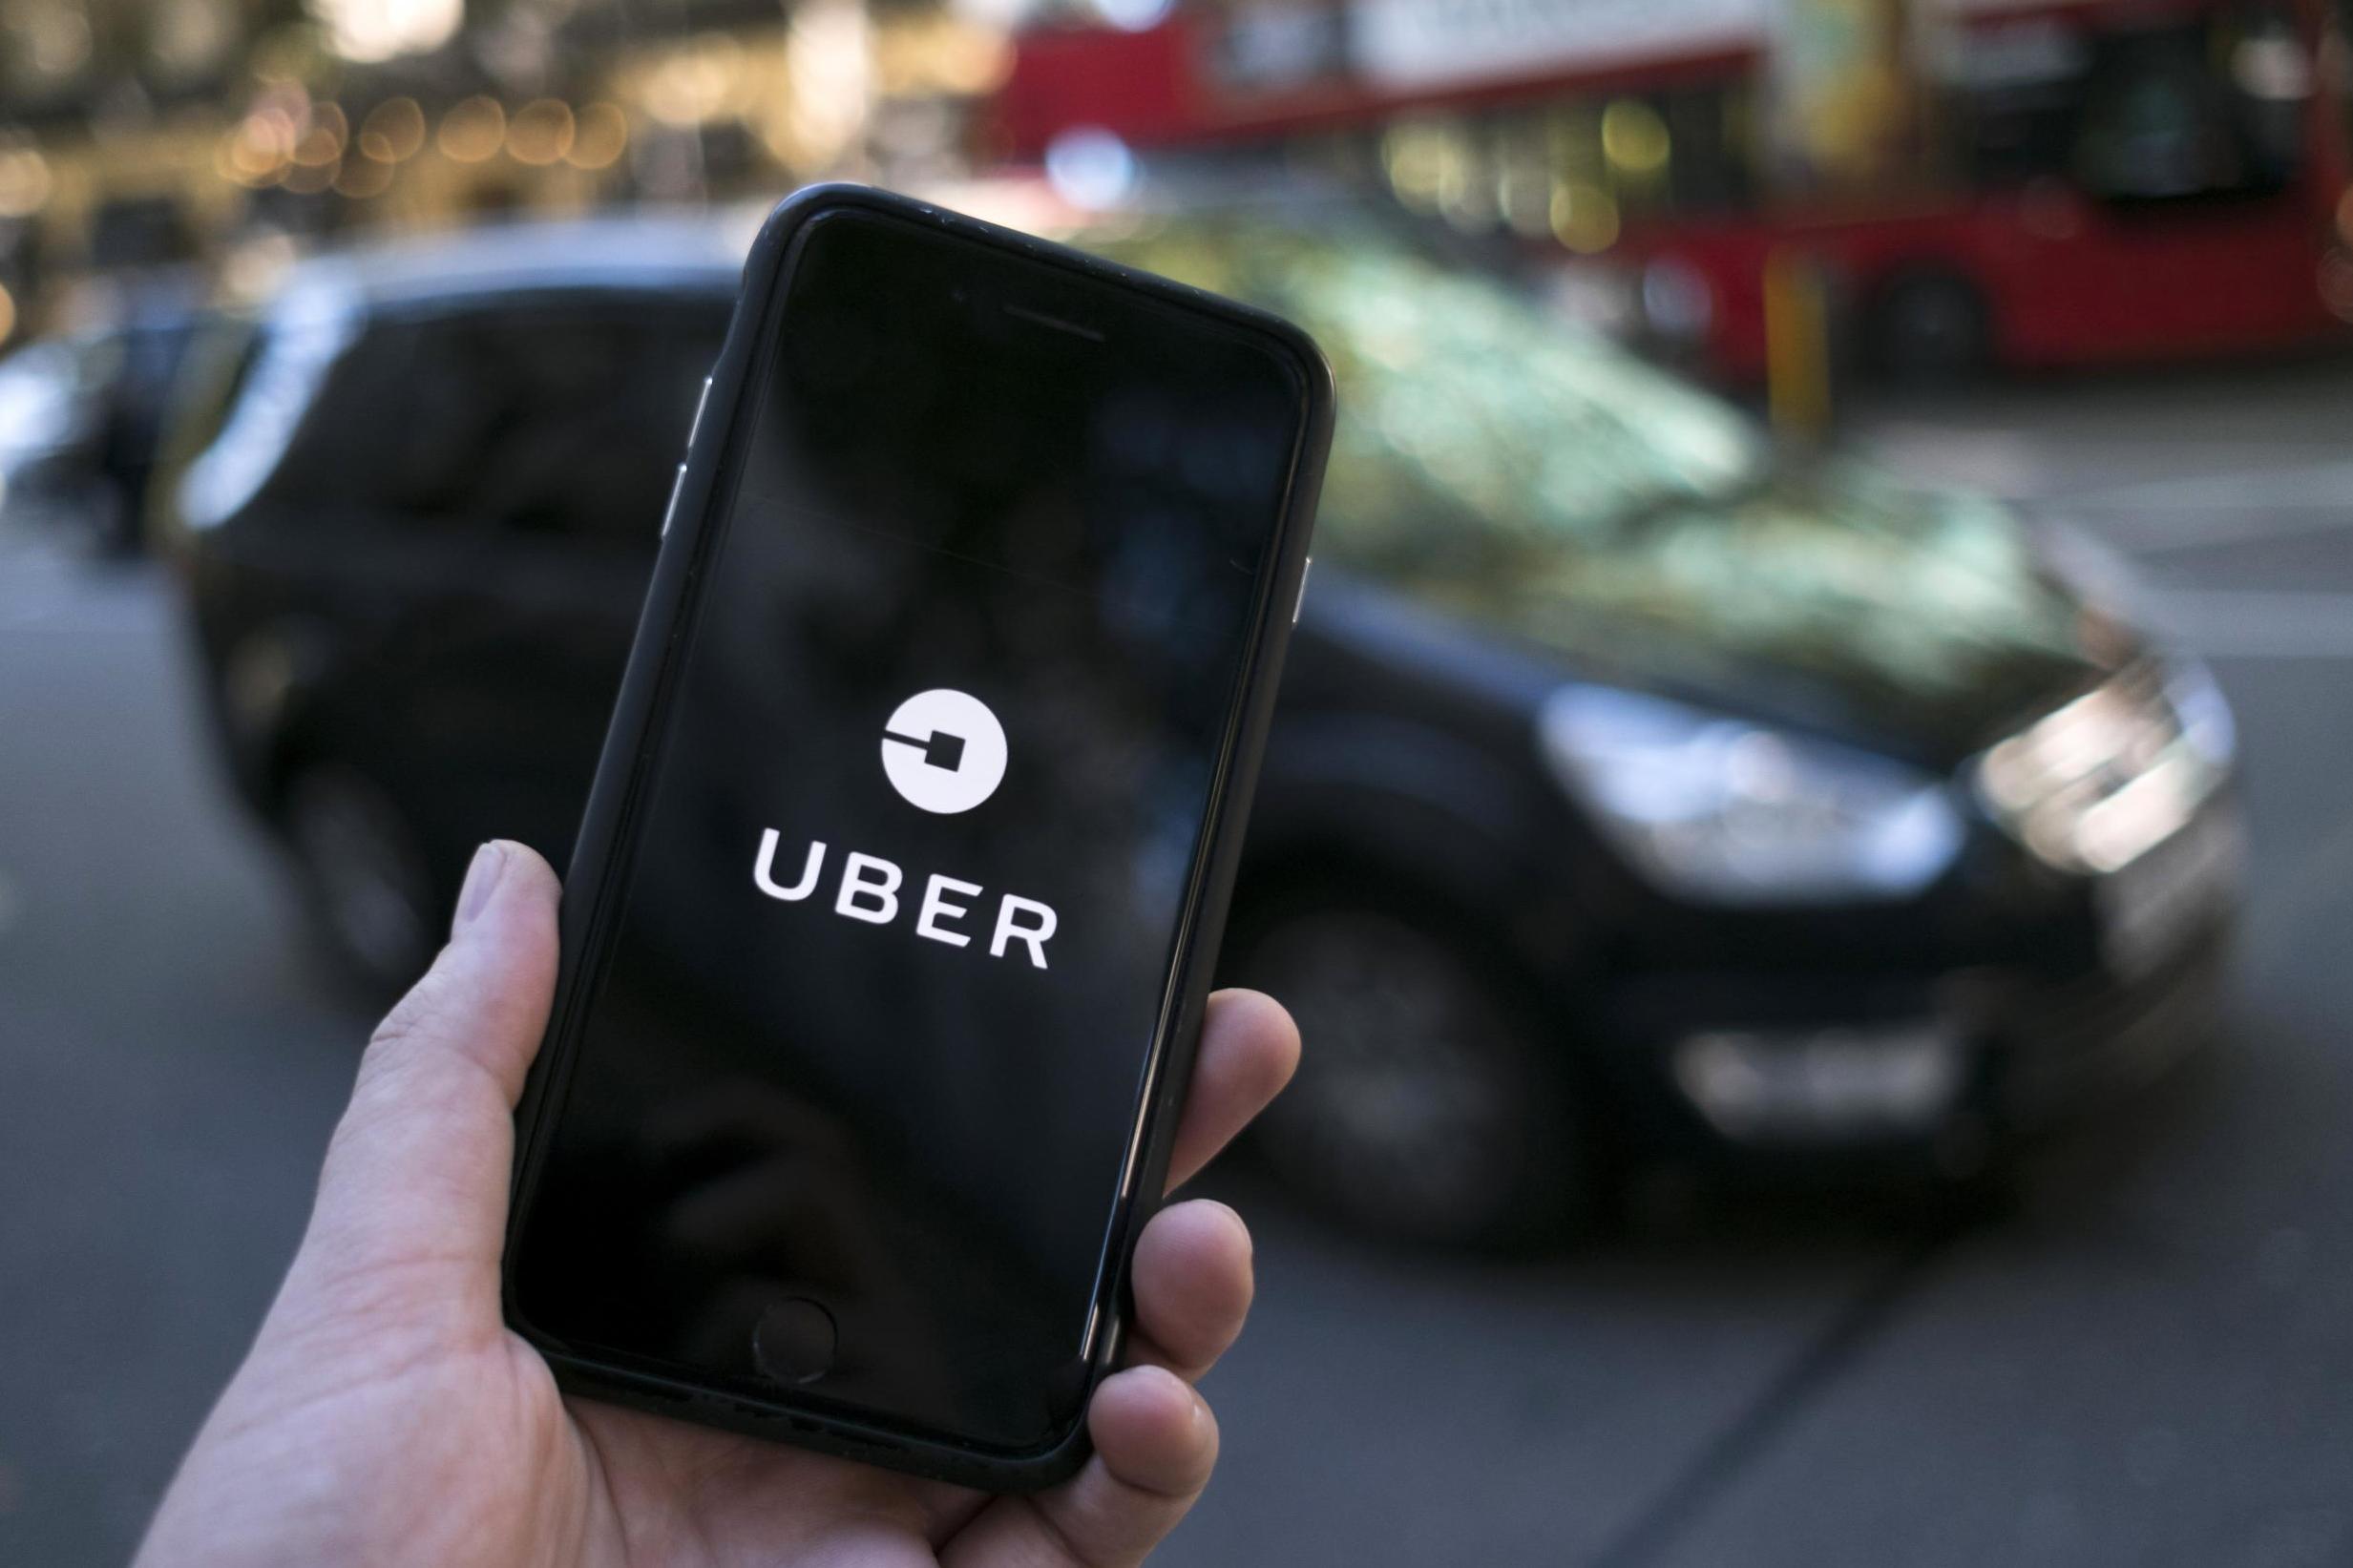 uber - photo #16